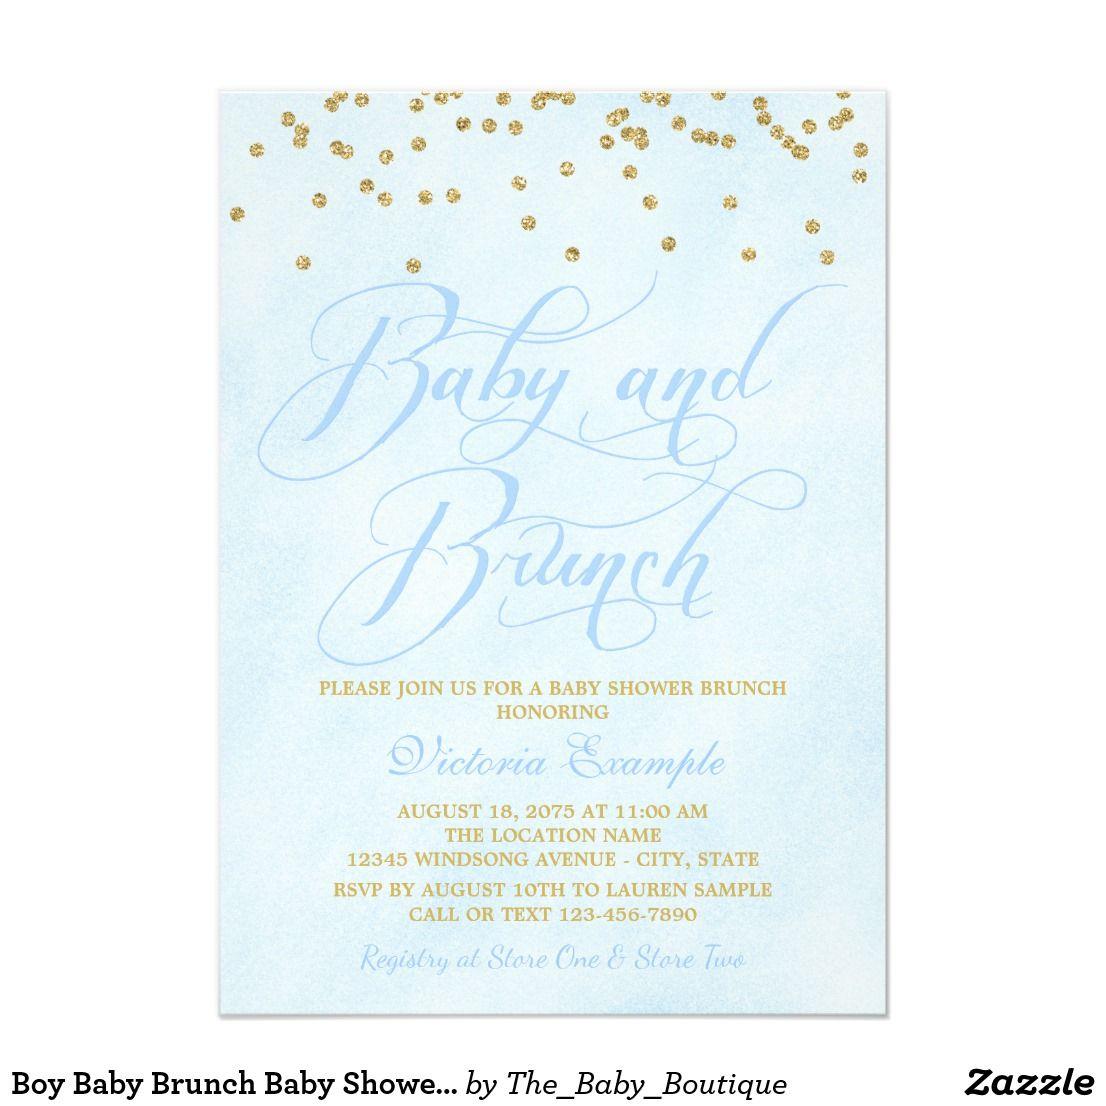 Boy Baby Brunch Baby Shower Invitations | Baby shower brunch, Brunch ...